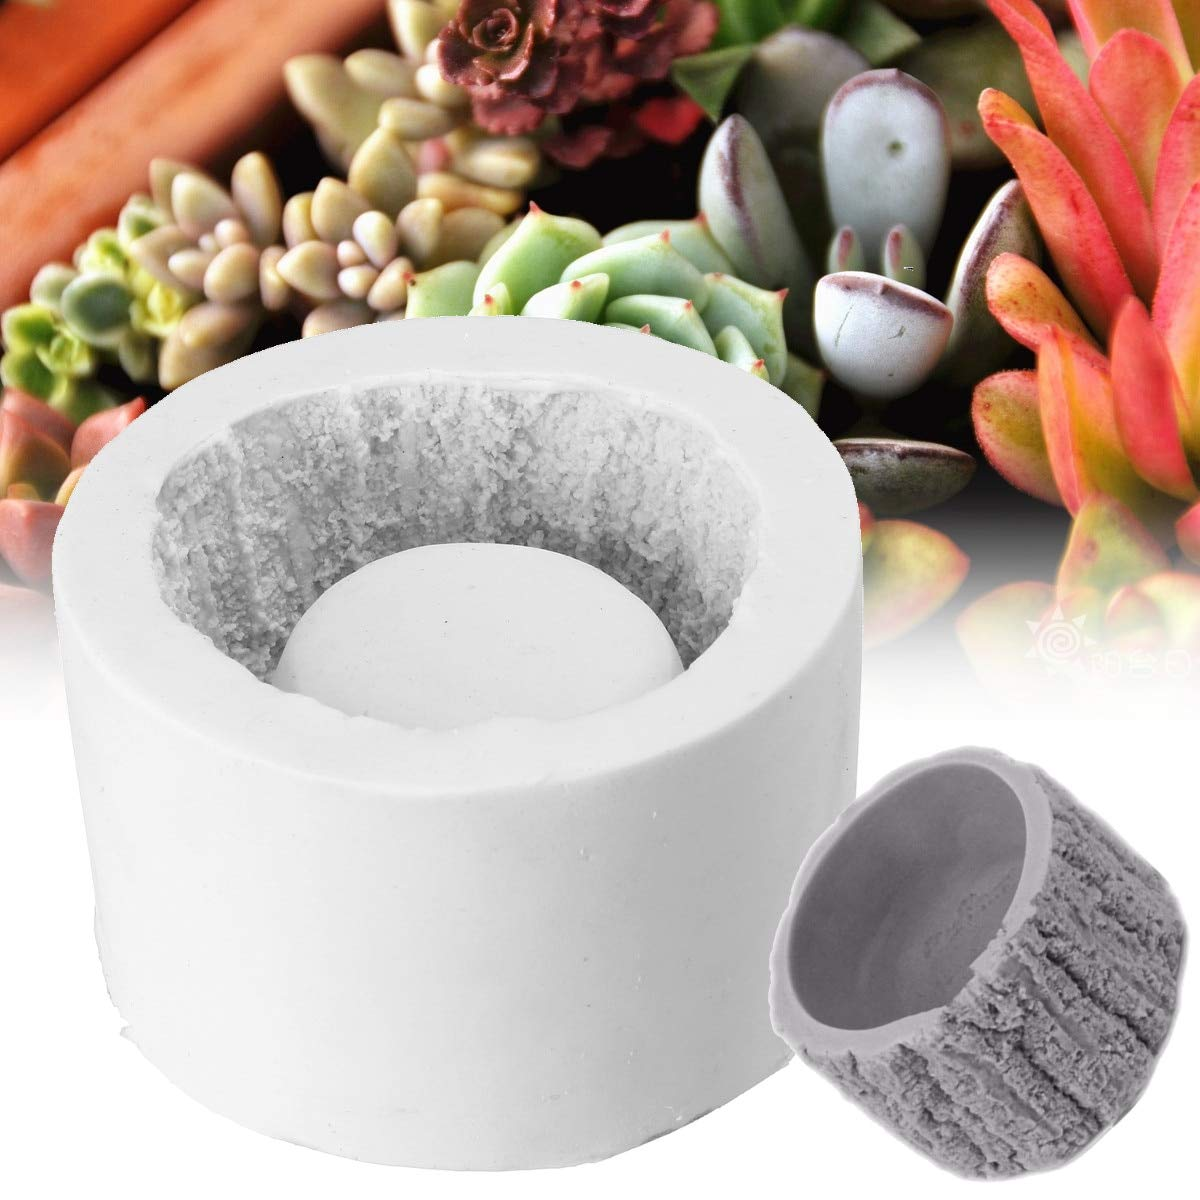 Silicone Mold Ceramic Clay Craft Casting Concrete Cup Mold Cactus Flower Pot DIY Garden Planter Random Color